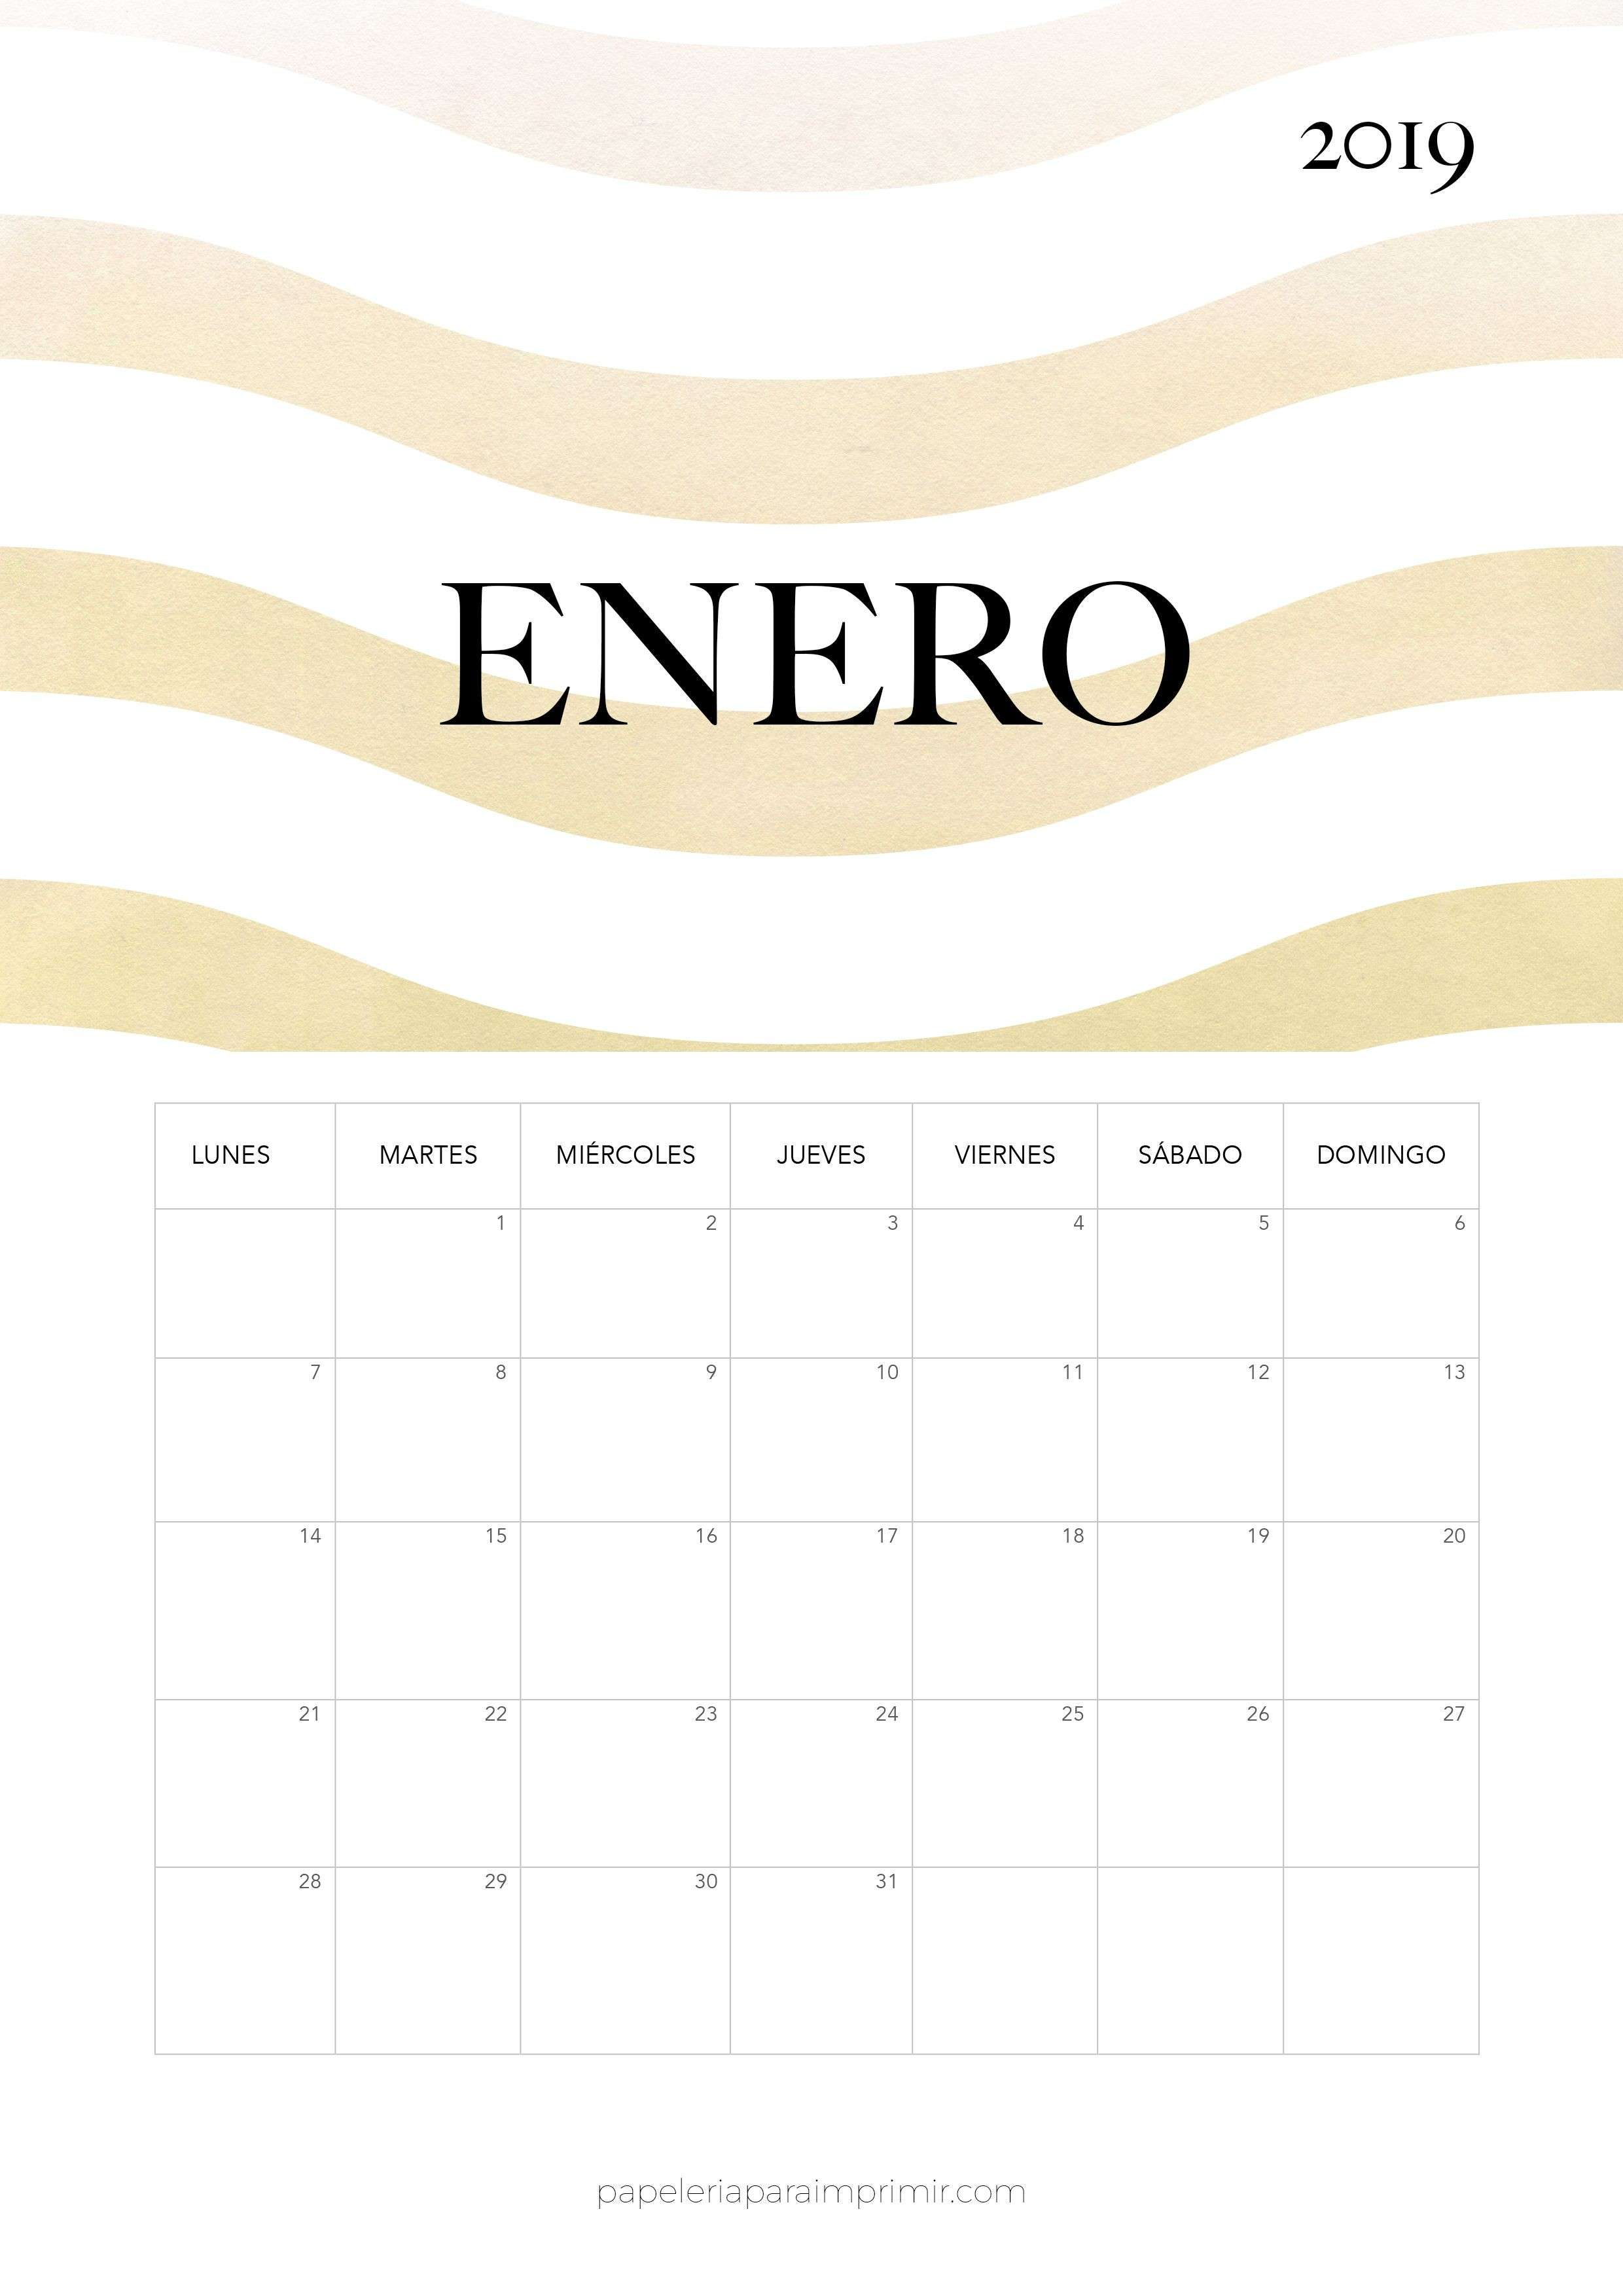 Calendario 2019 Escolar Df Más Arriba-a-fecha Calendario 2019 Enero Calendario Mensual De Estilo Minimal Moderno